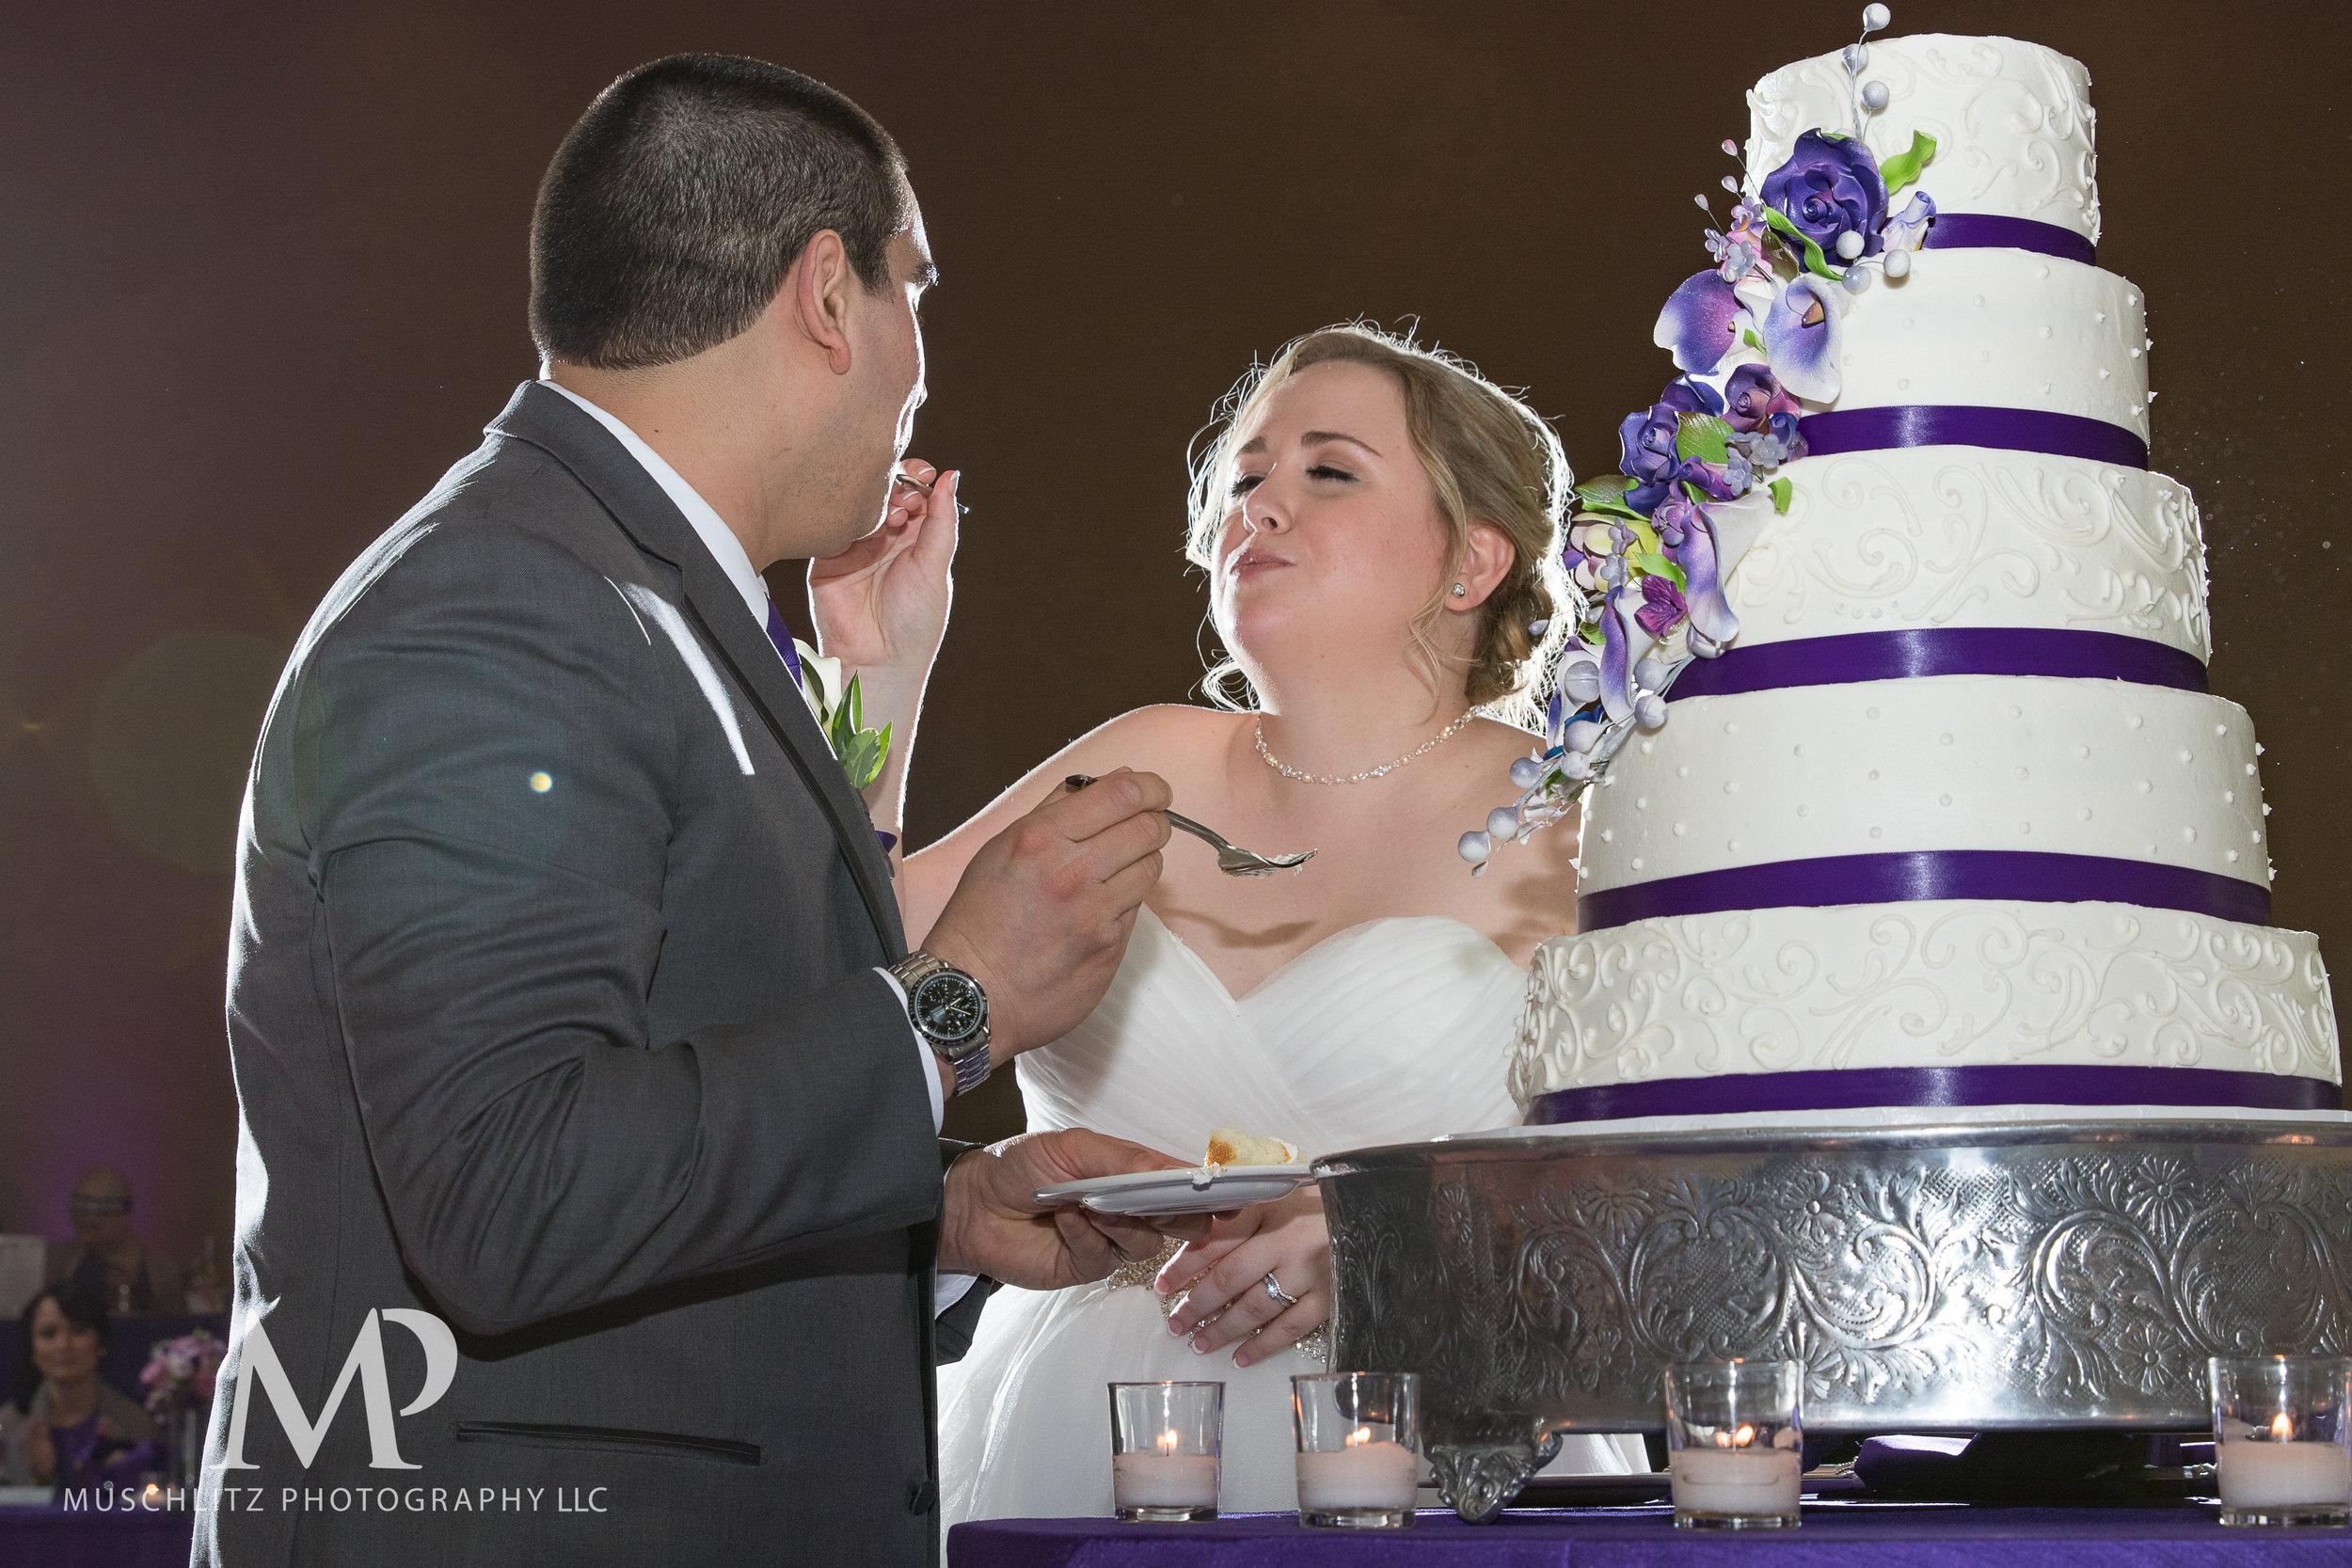 hilton-polaris-wedding-columbus-ohio-muschlitz-photography-037.JPG